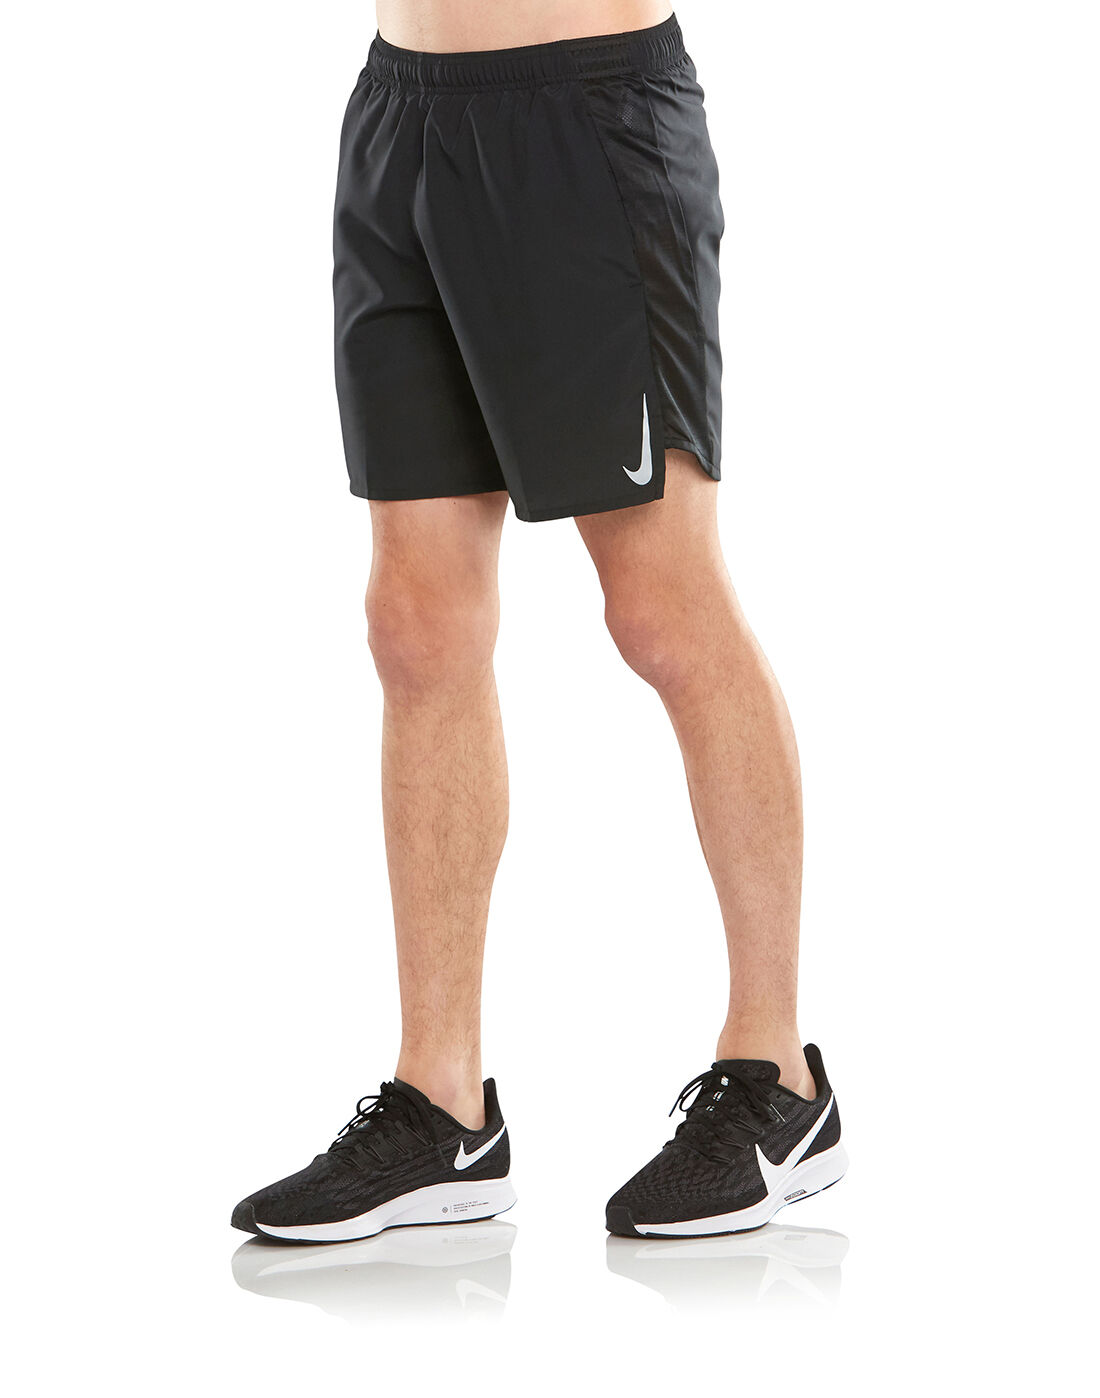 nike shorts 5 inch